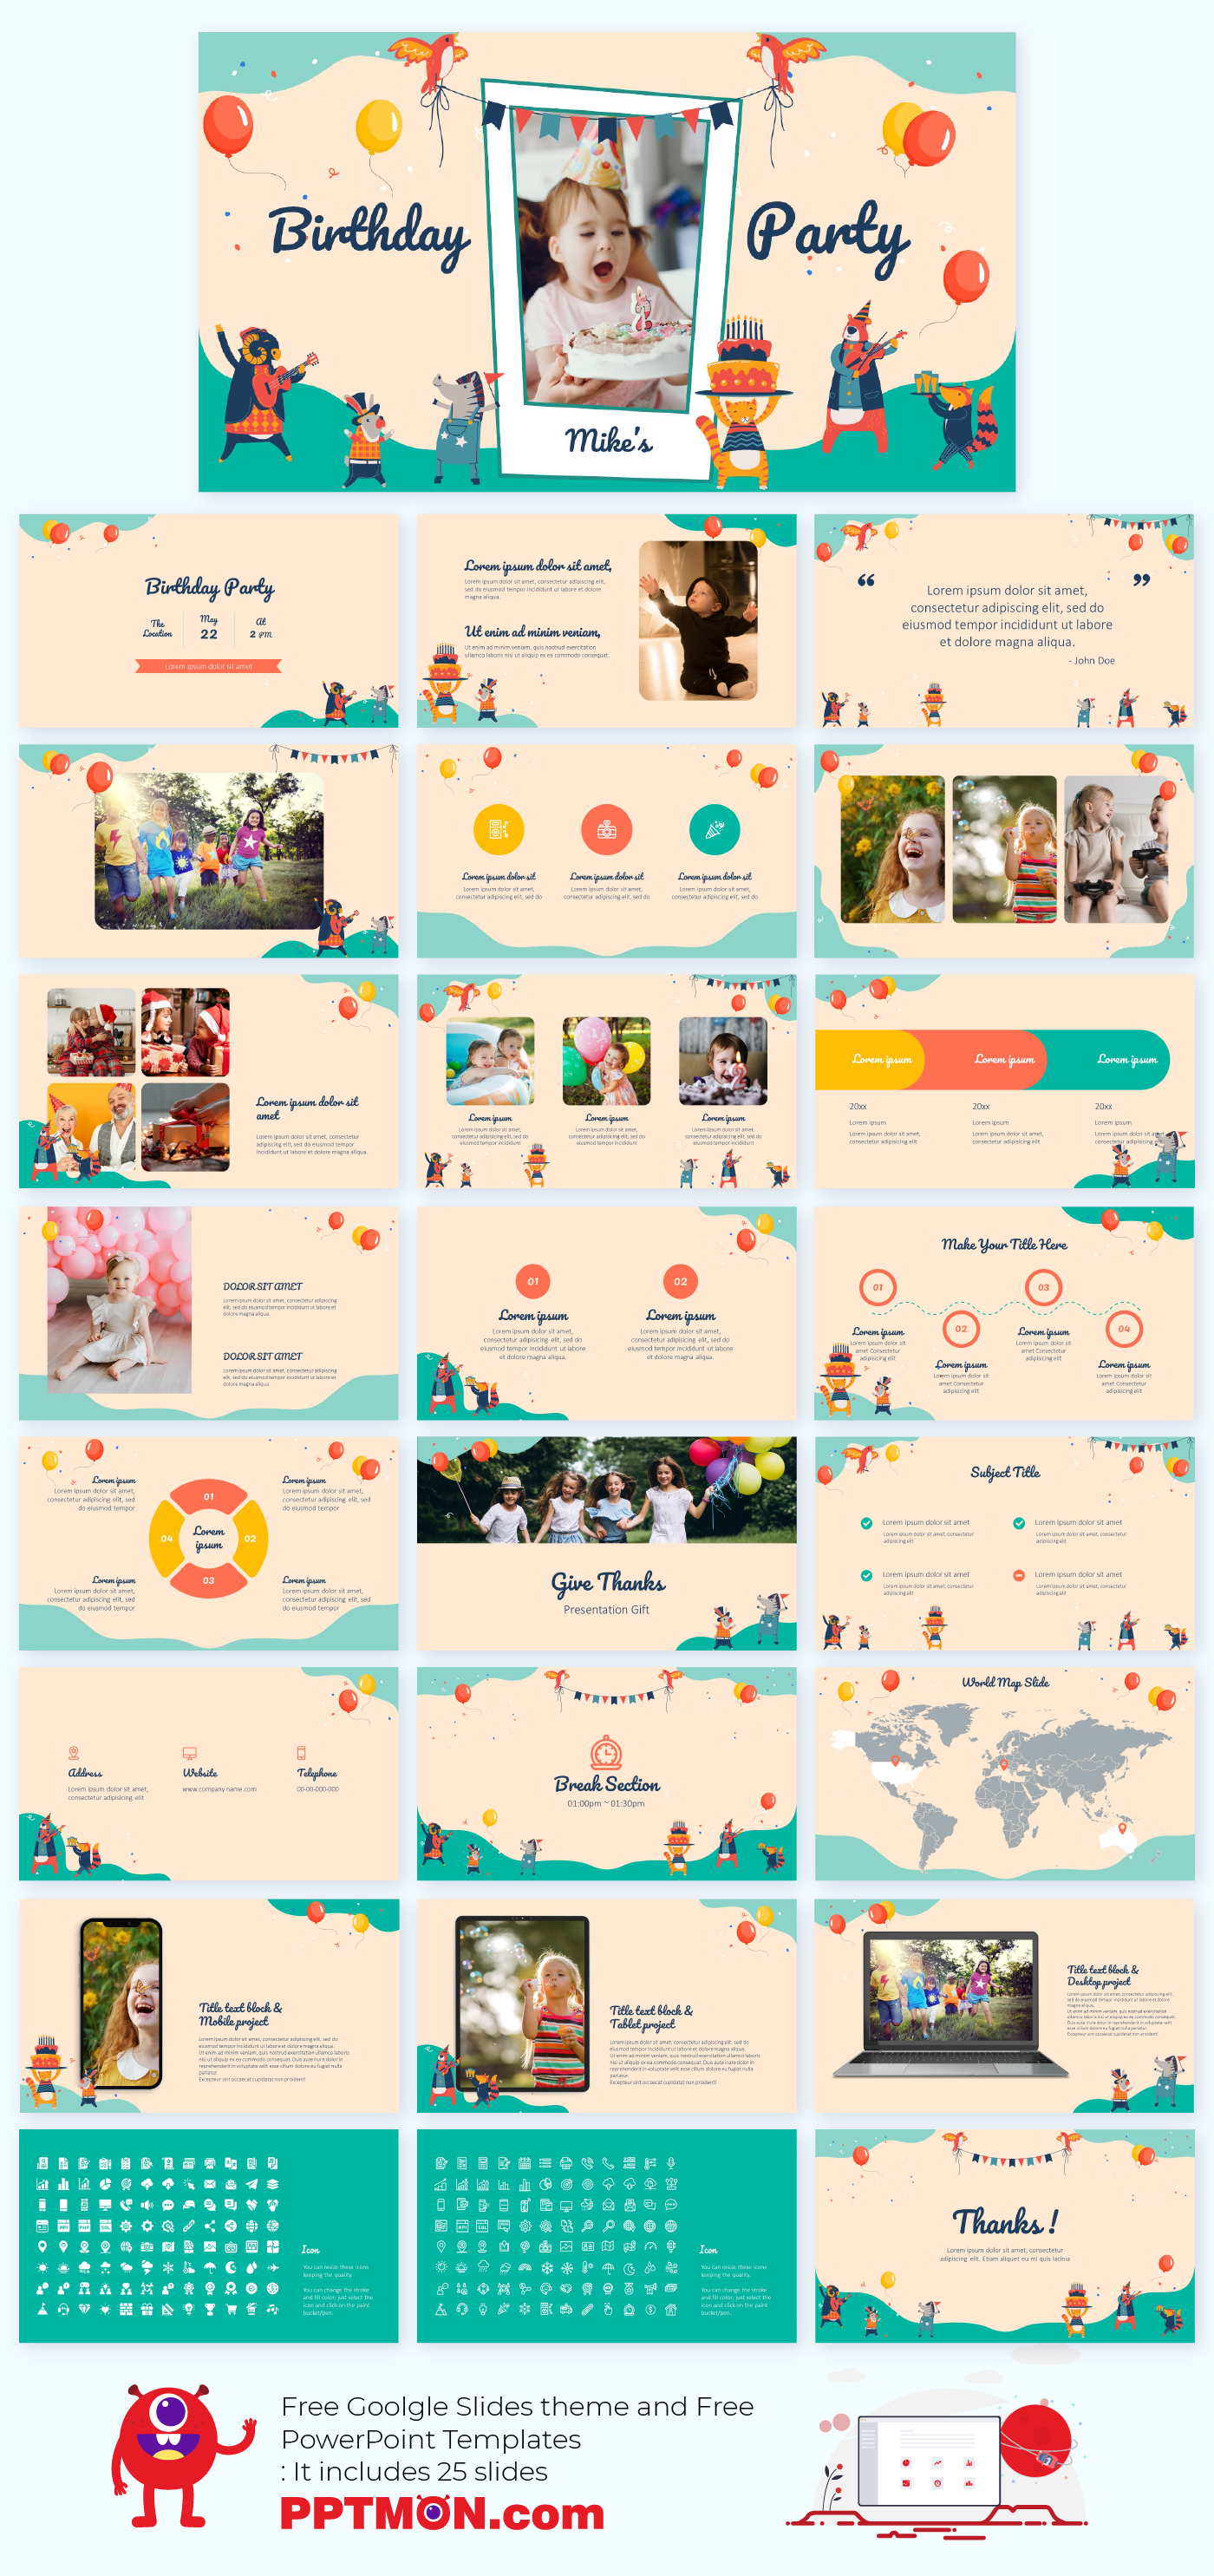 Birthday Card Free Google Slides Theme Powerpoint Template Cute Powerpoint Templates Powerpoint Design Templates Powerpoint Templates